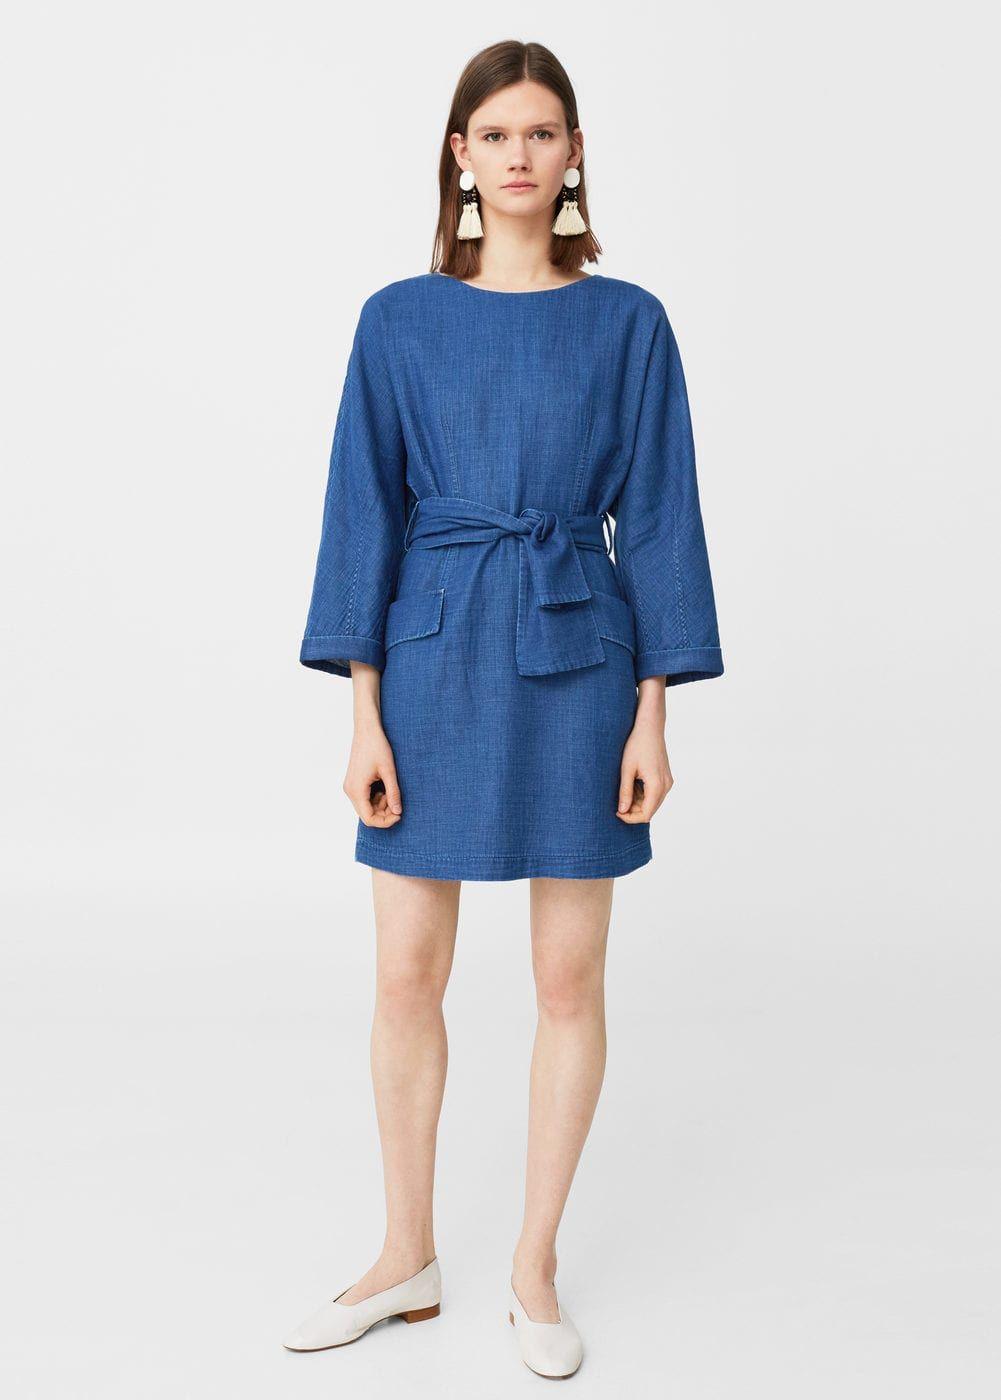 288bbd403f Medium denim dress - Women